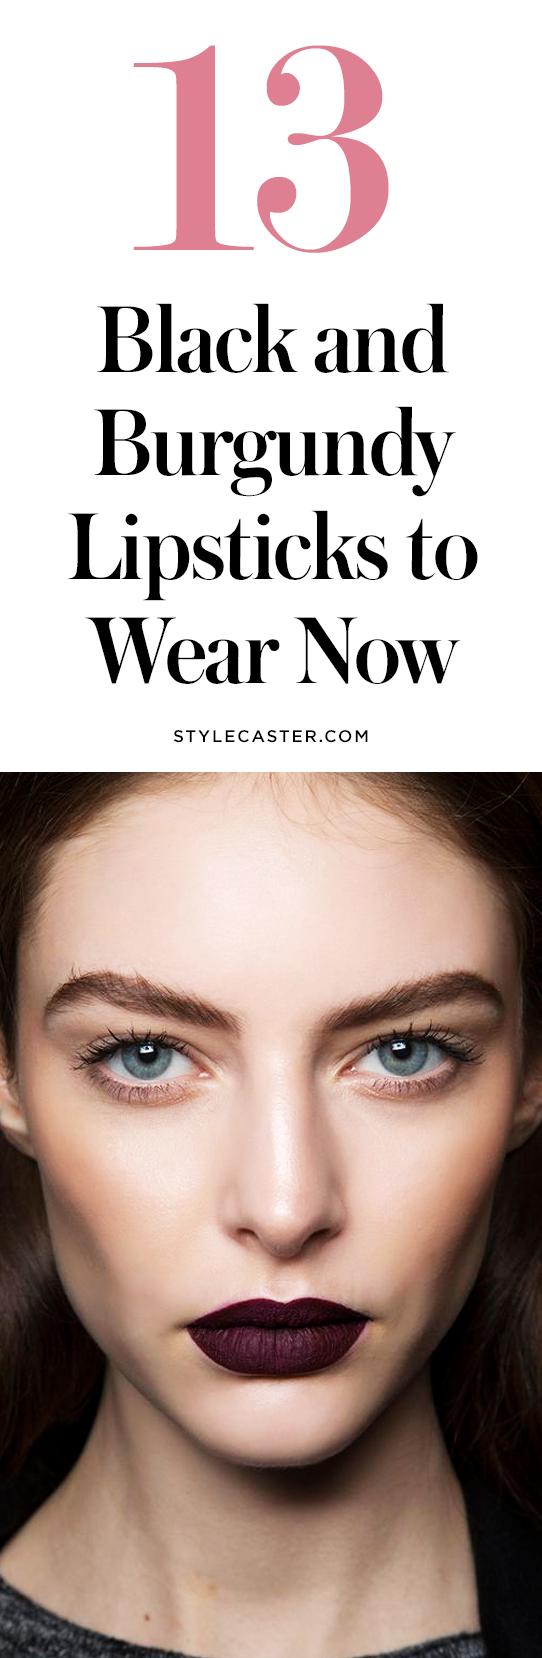 The best black and burgundy lipsticks | @stylecaster